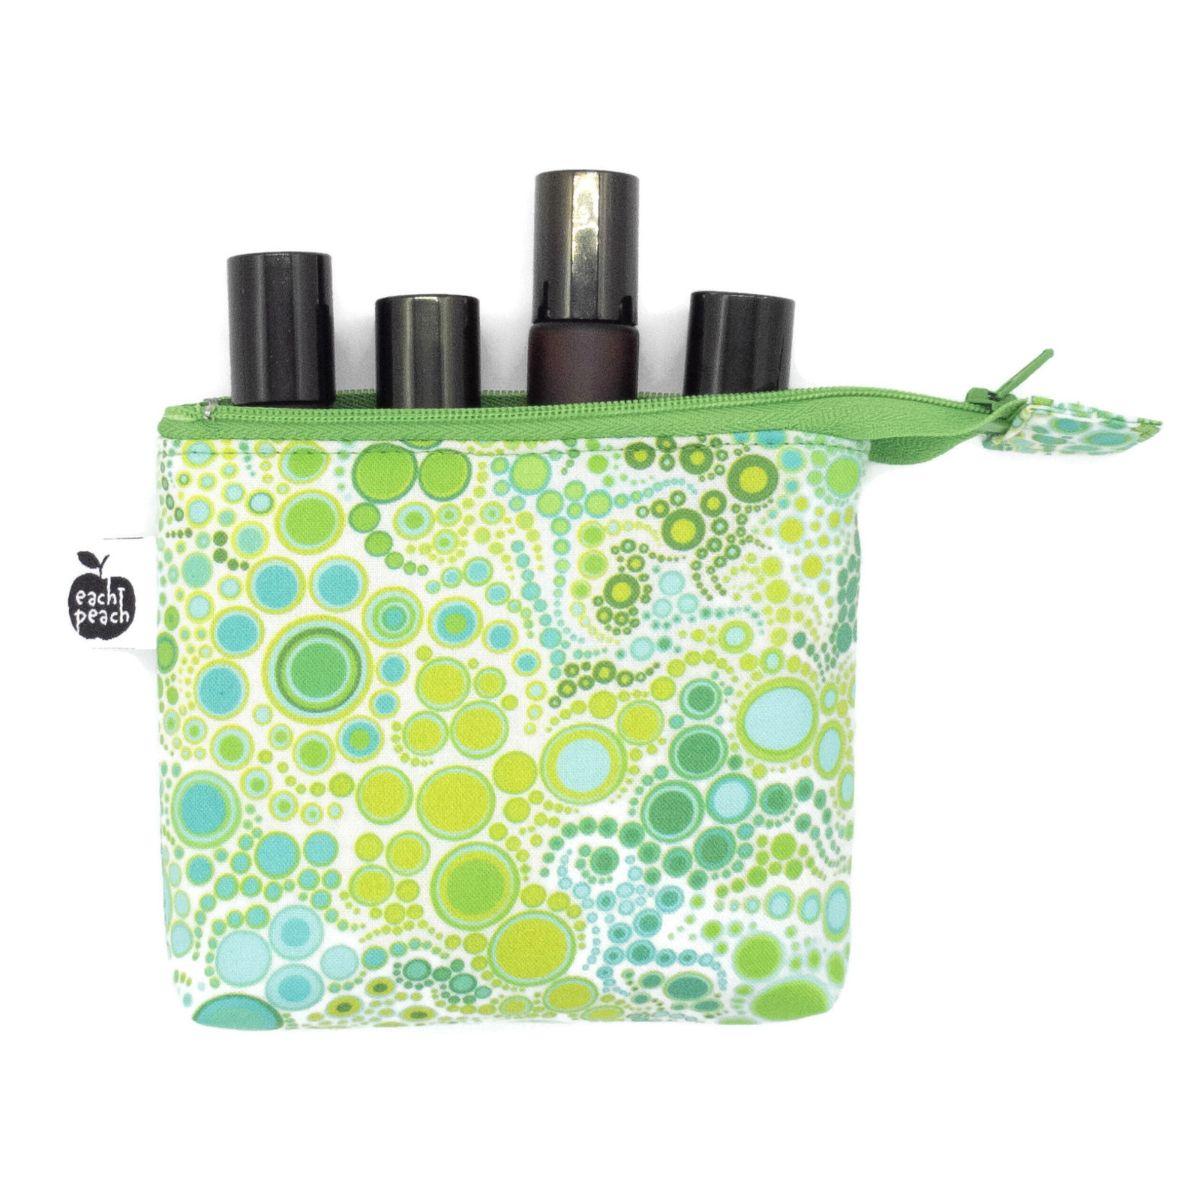 essential-oil-storage-bag-green-apple